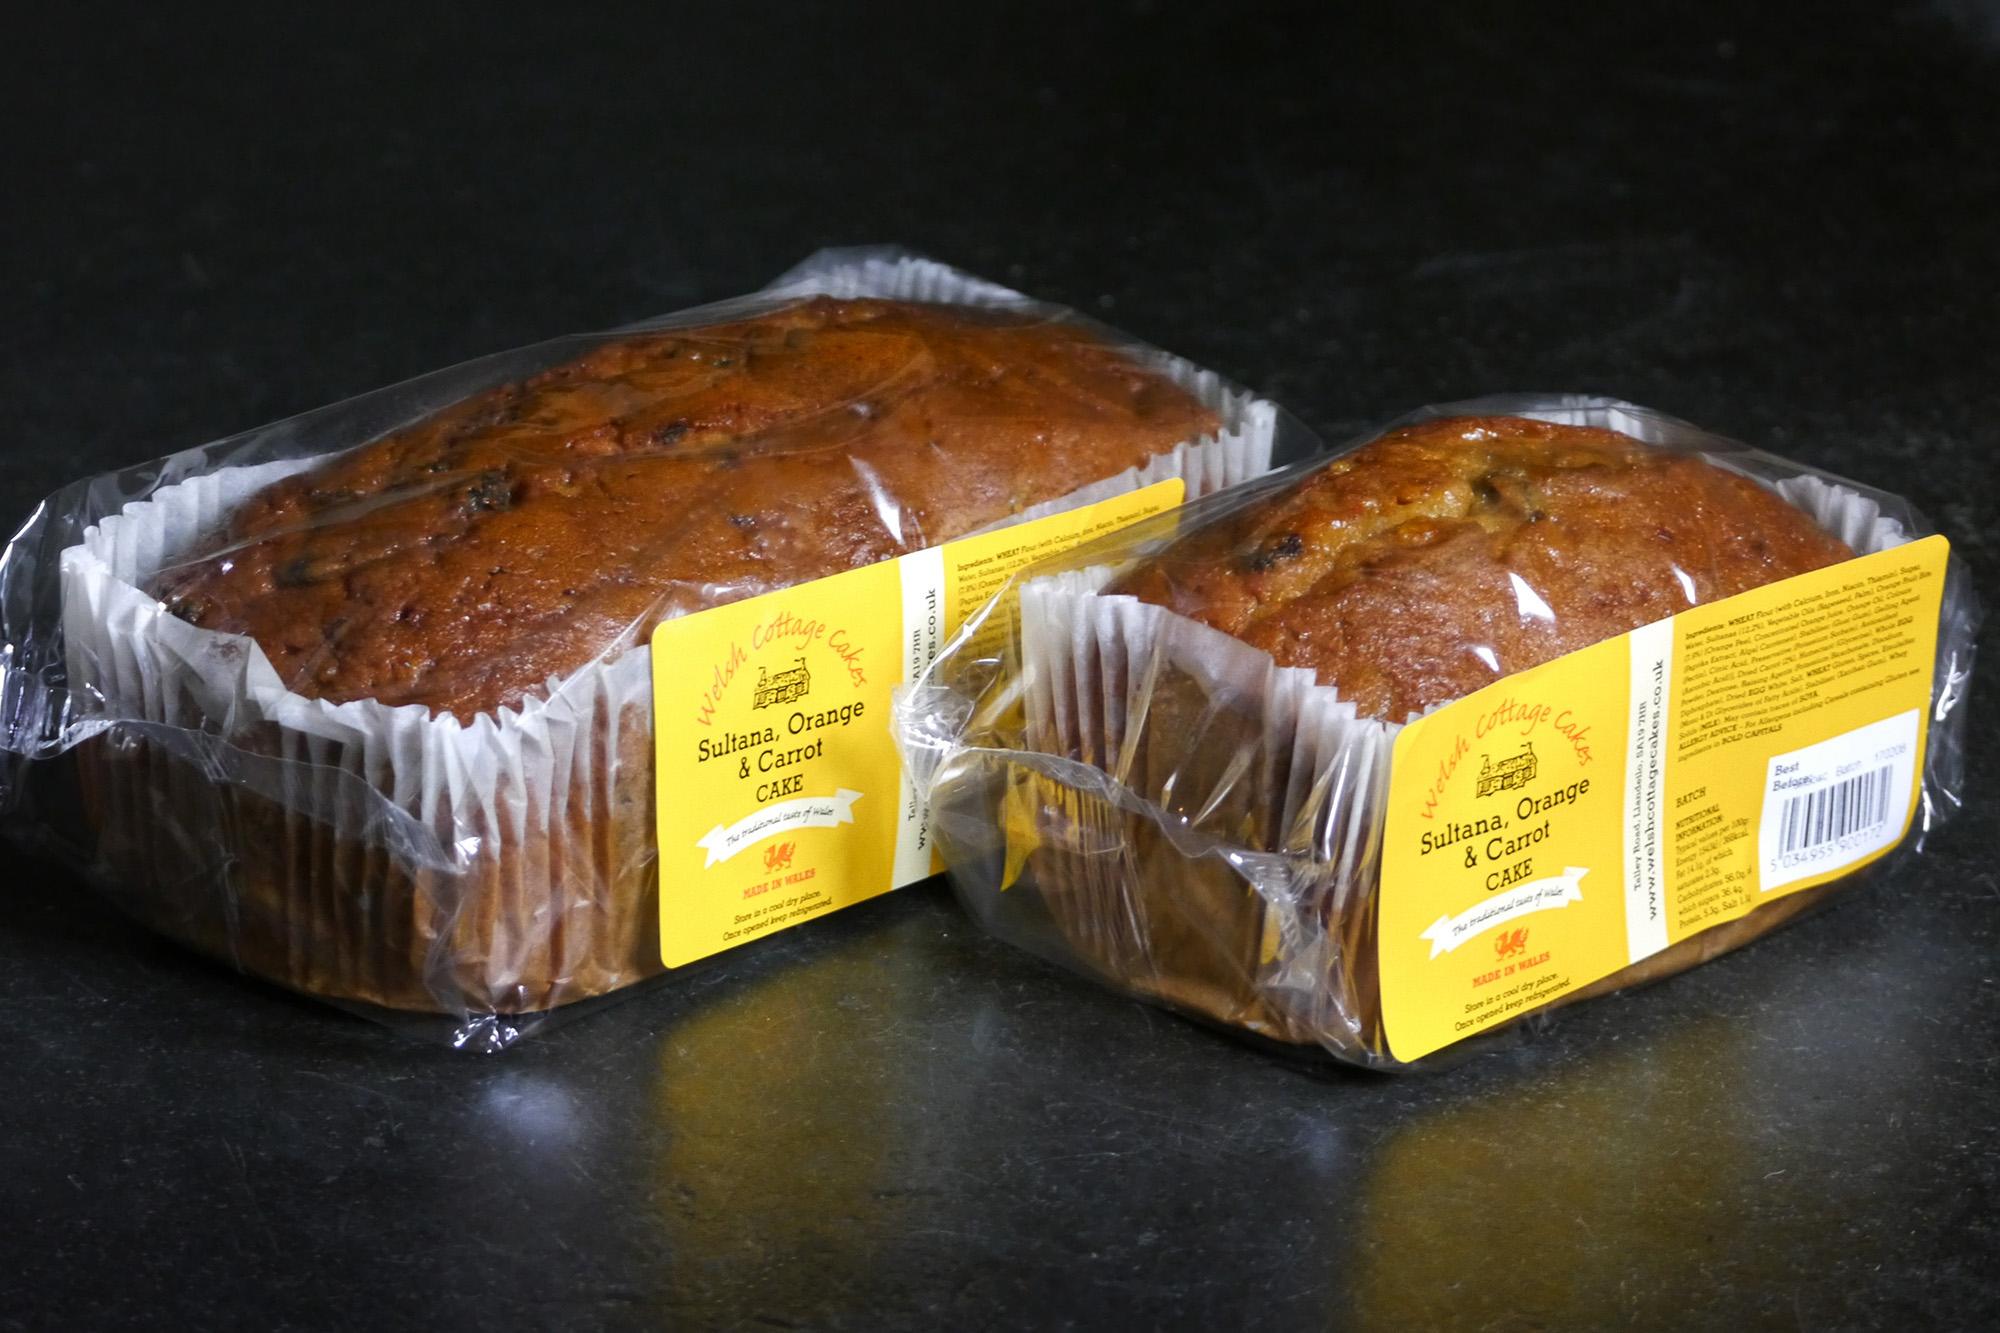 Sultana, Orange & Carrot Cake Packshot